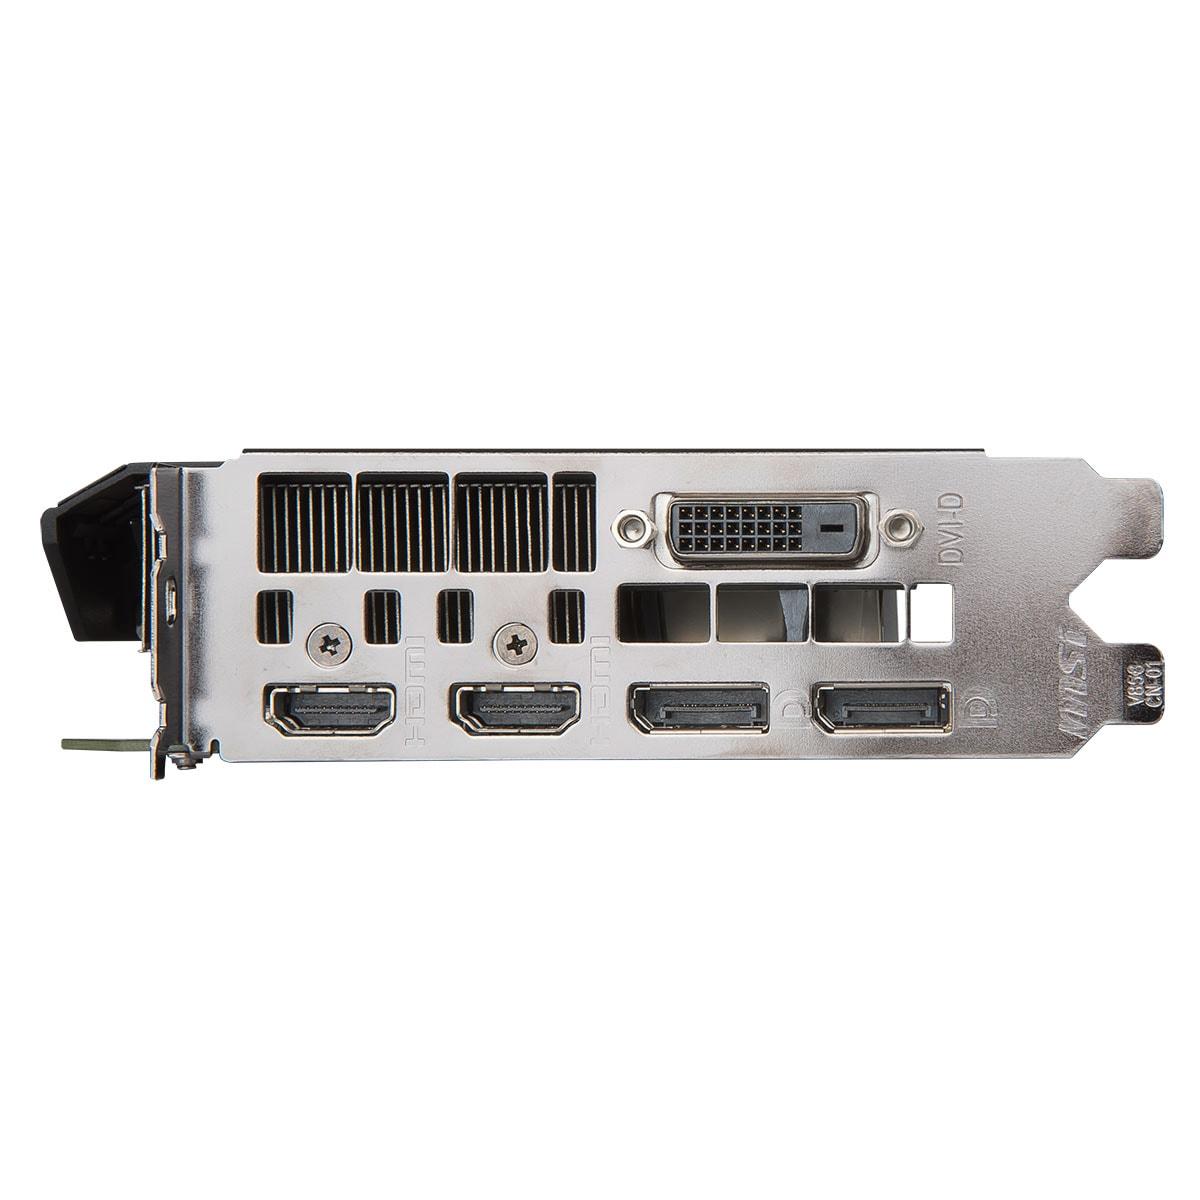 MSI GTX 1070 AERO ITX 8G OC 8Go - Carte graphique MSI - 1